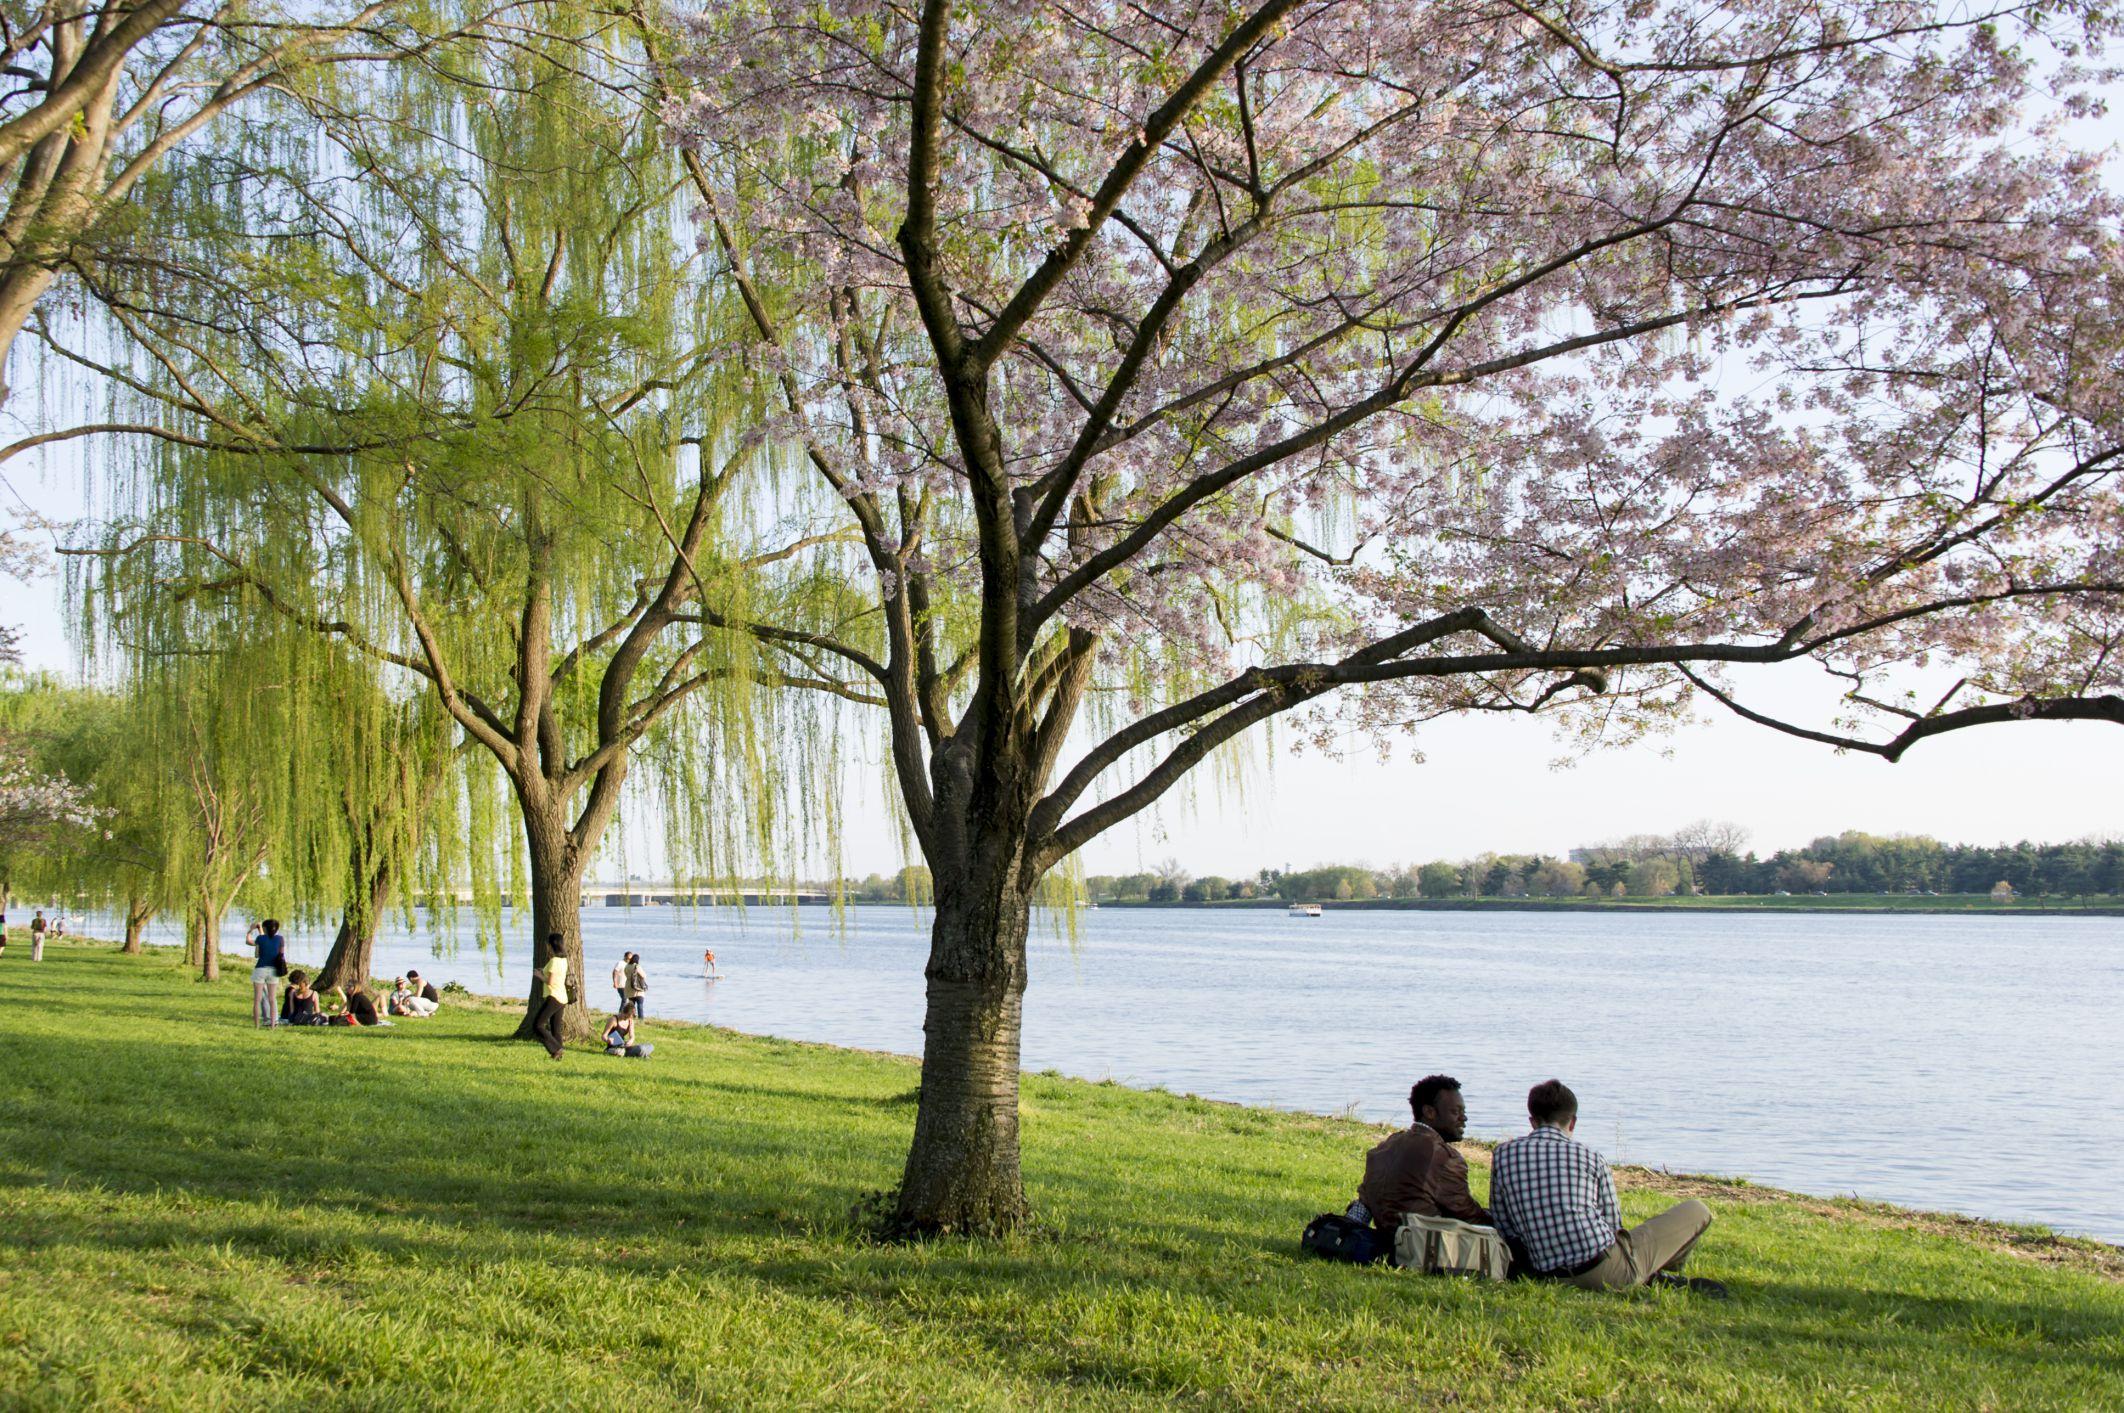 Potomac River Islands